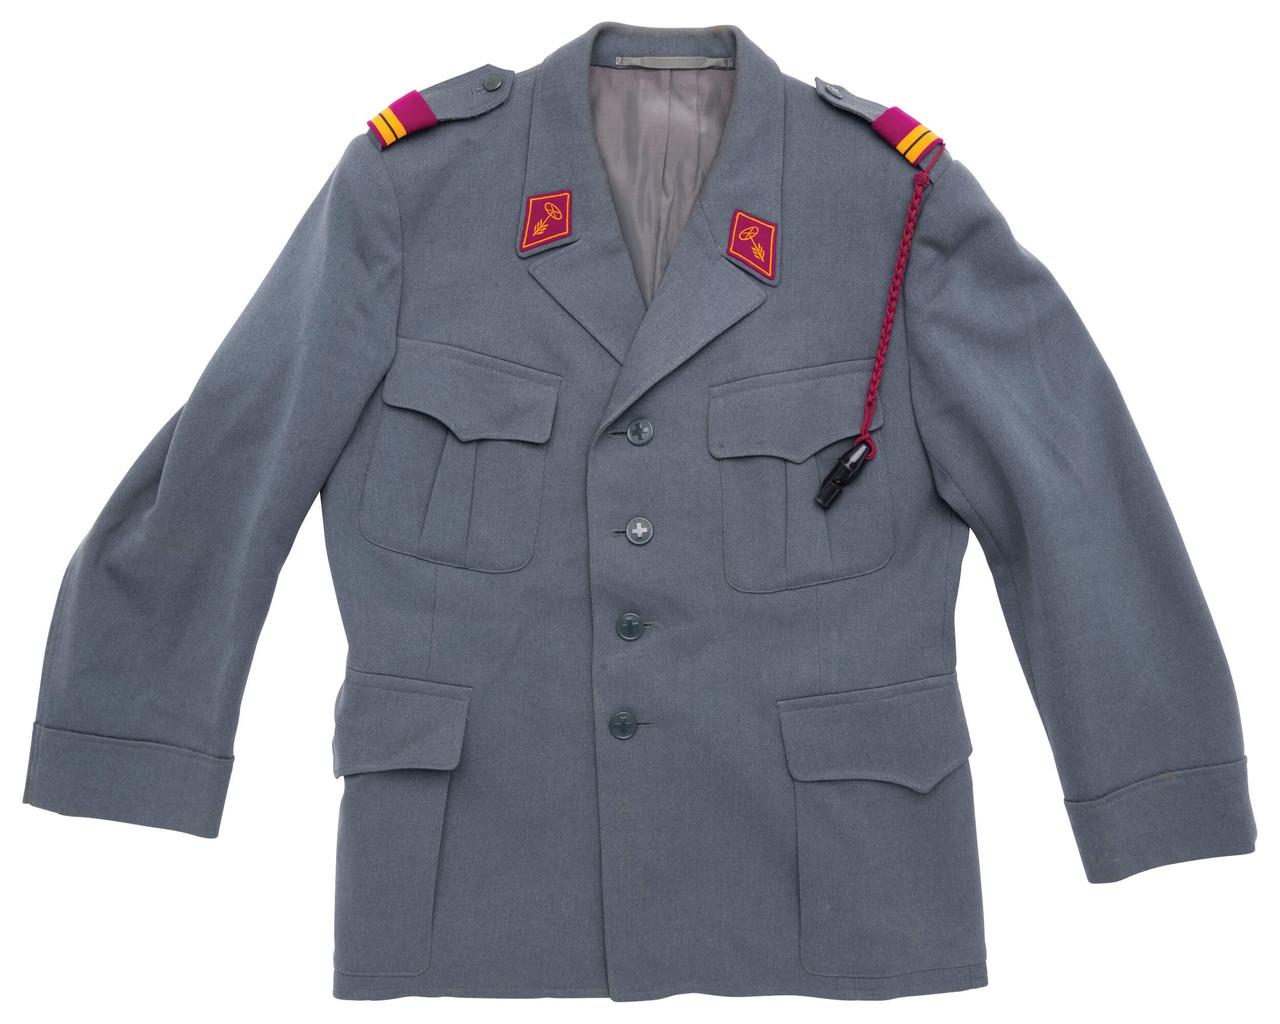 Swiss Army Lt Colonel Uniform - Materials Transportation / Driver